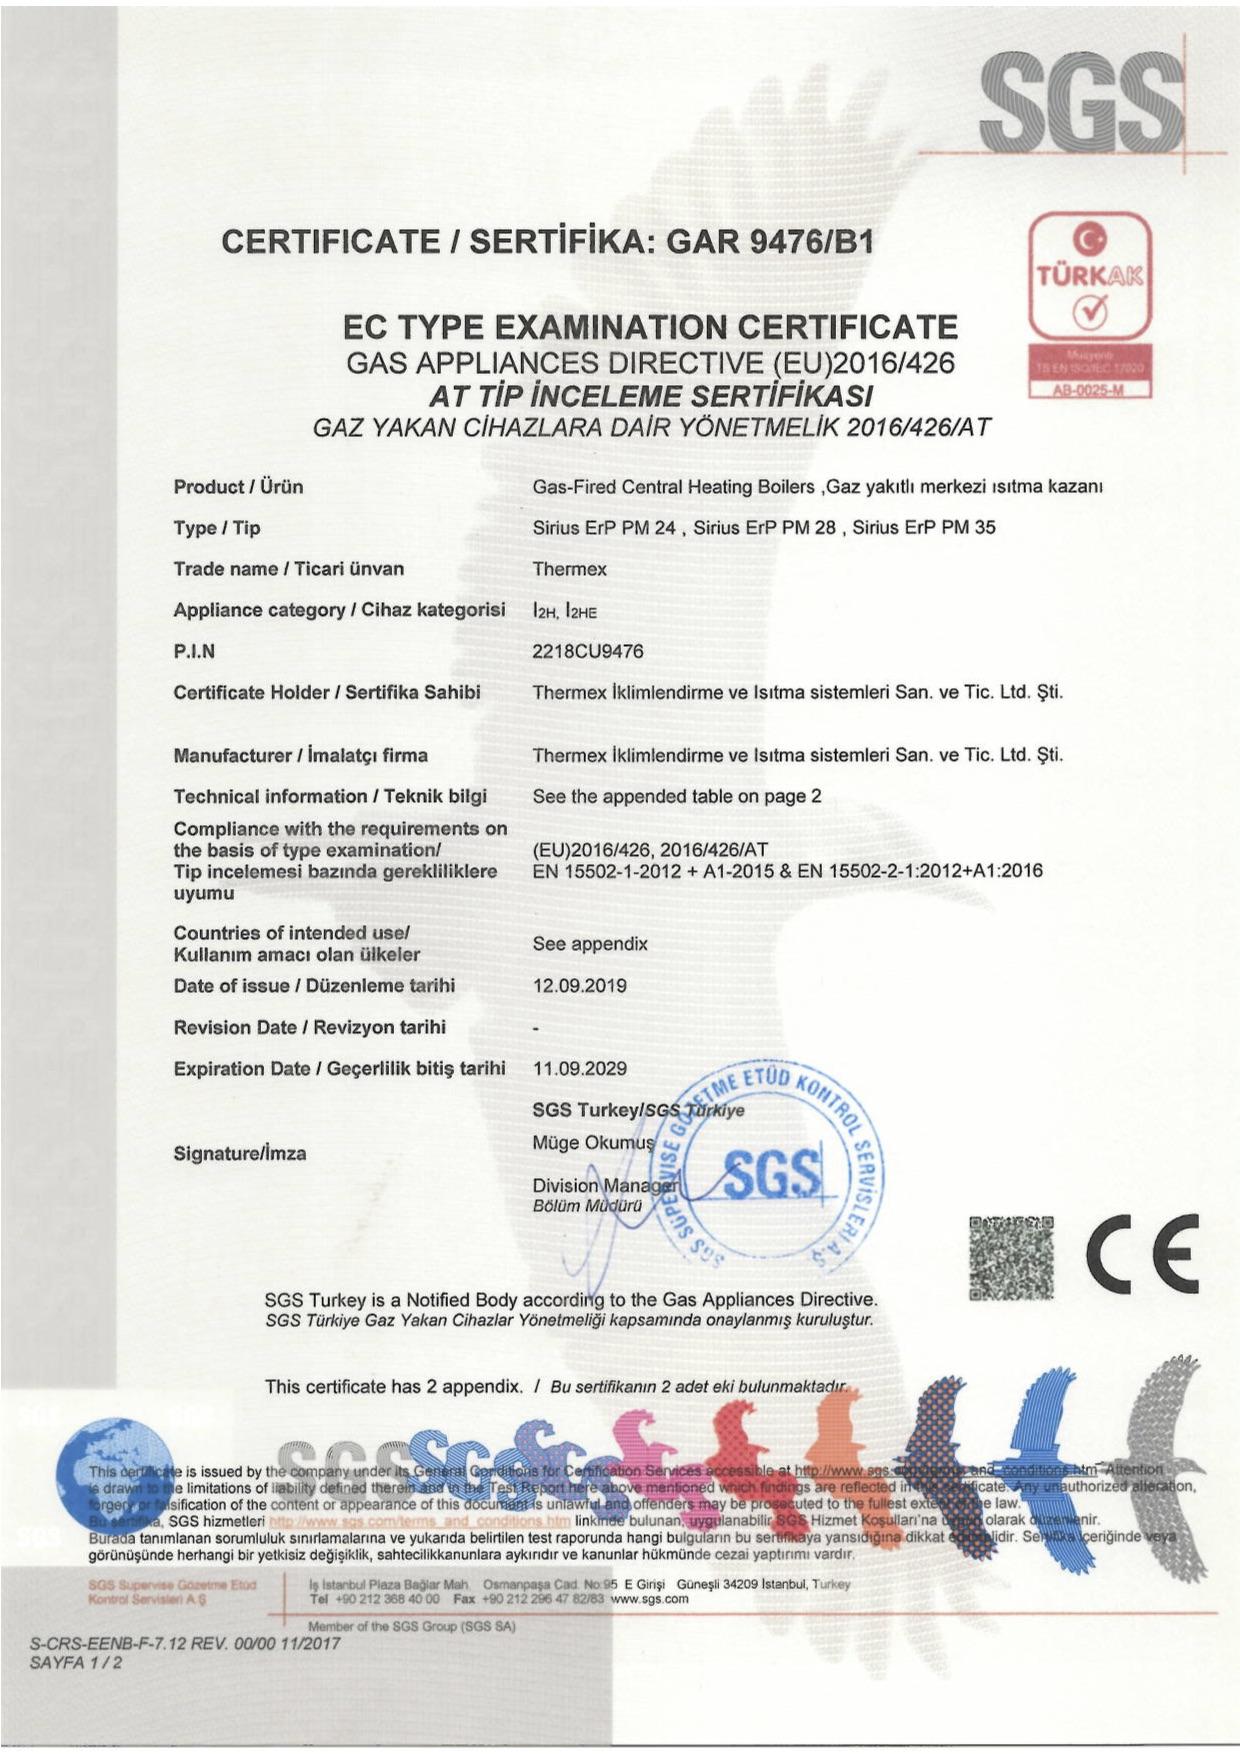 S-CRS-EE-F-31-Certificate-REV0200-thermex-SIRIUS